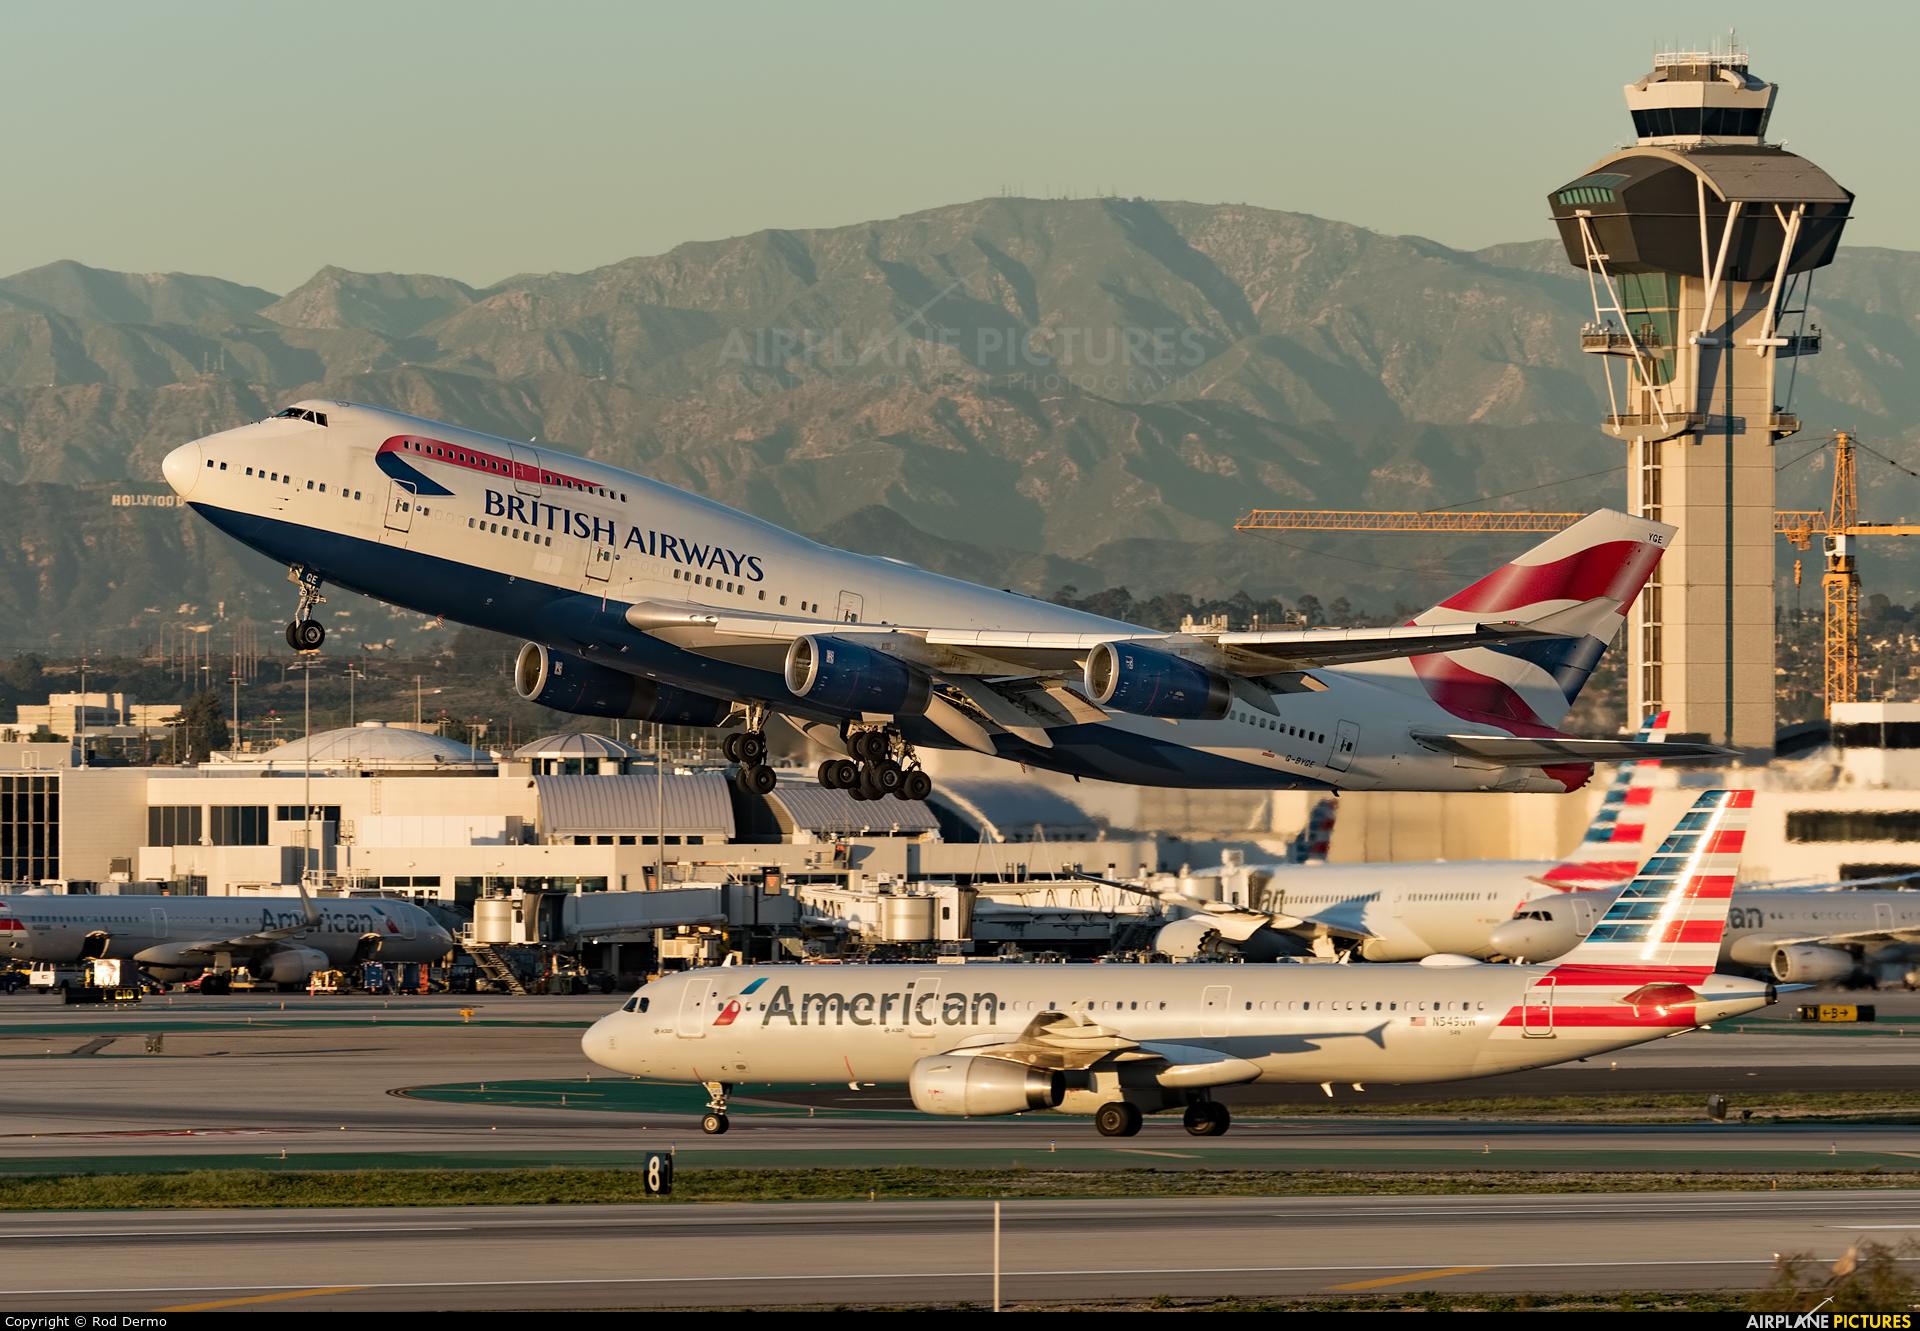 British Airways G-BYGE aircraft at Los Angeles Intl